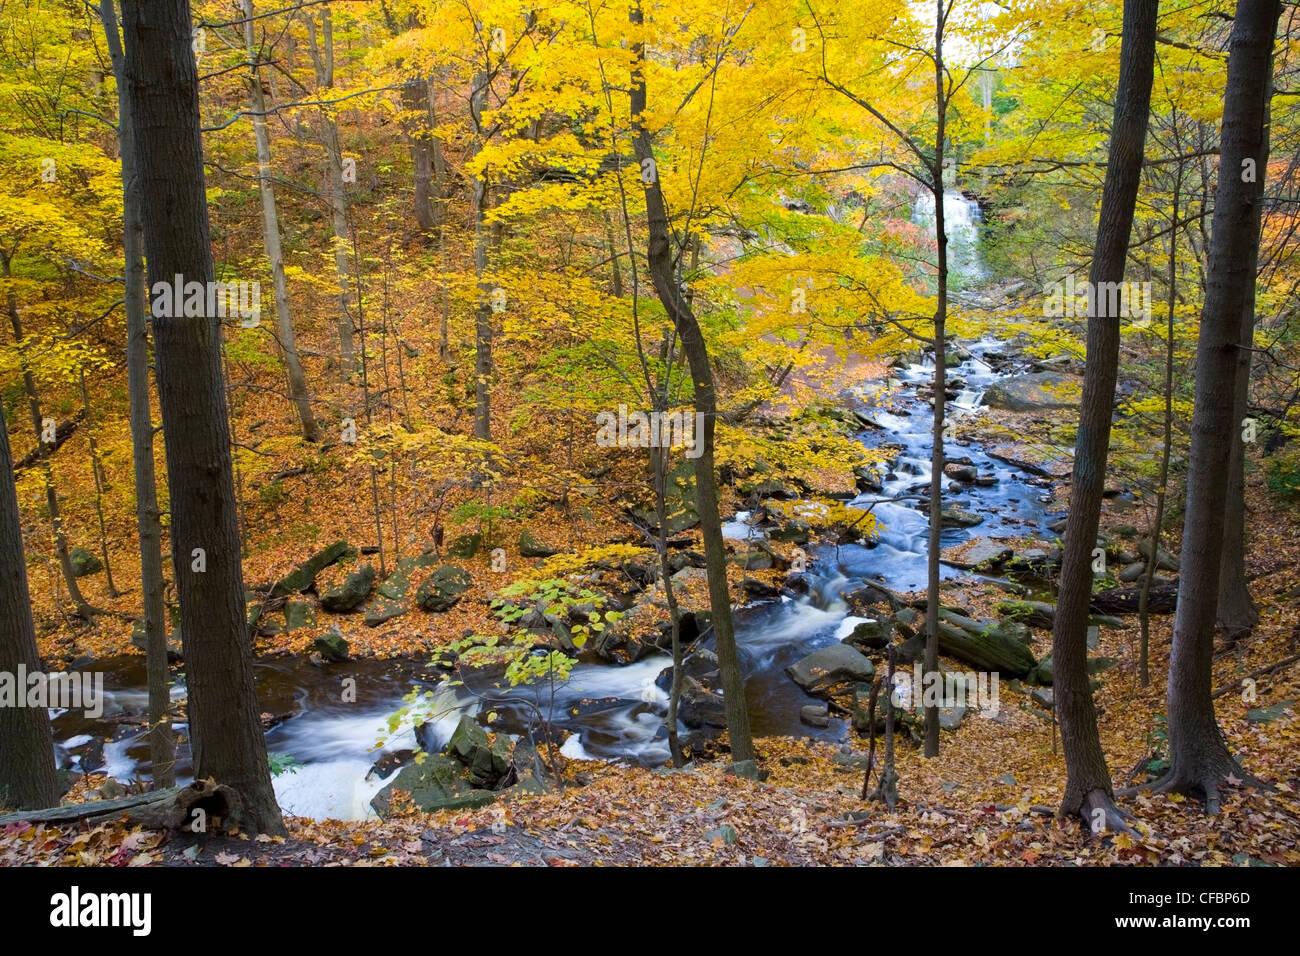 Grindstone Creek and Grand Falls in fall, Bruce Trail, Niagara Escarpment, Hamilton, Ontario, Canada - Stock Image